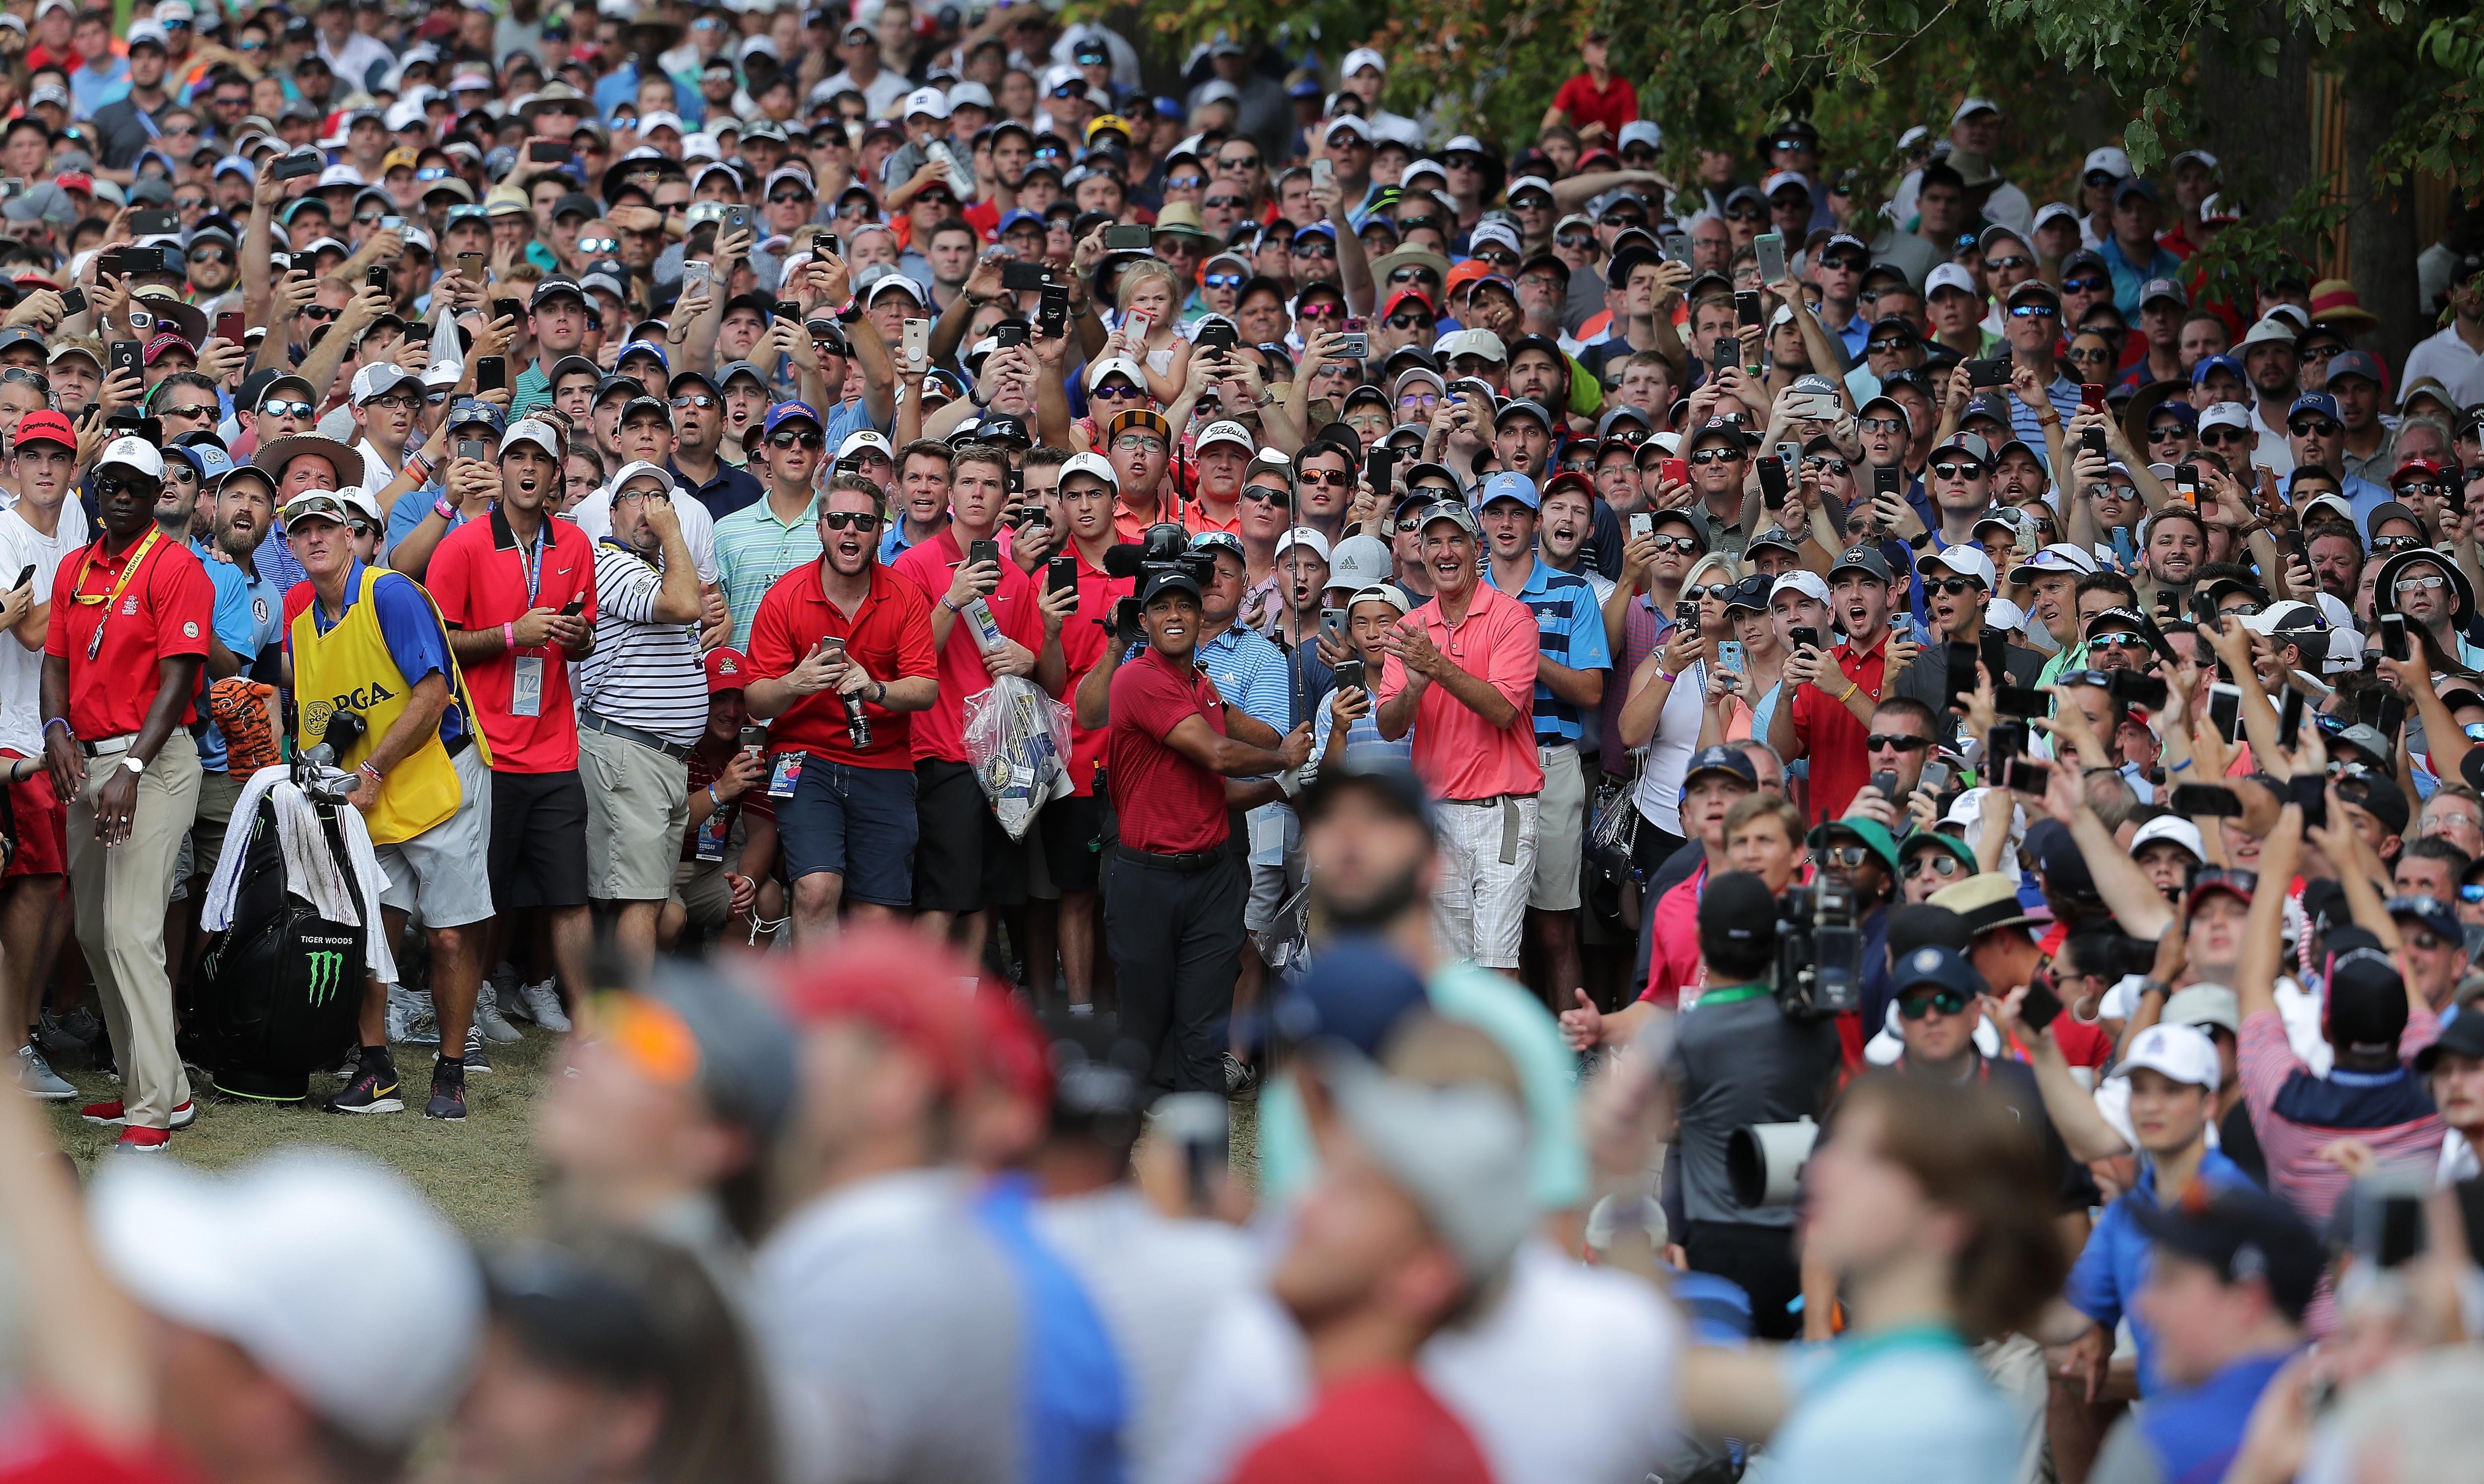 Tiger Woods at the 2018 PGA Championship